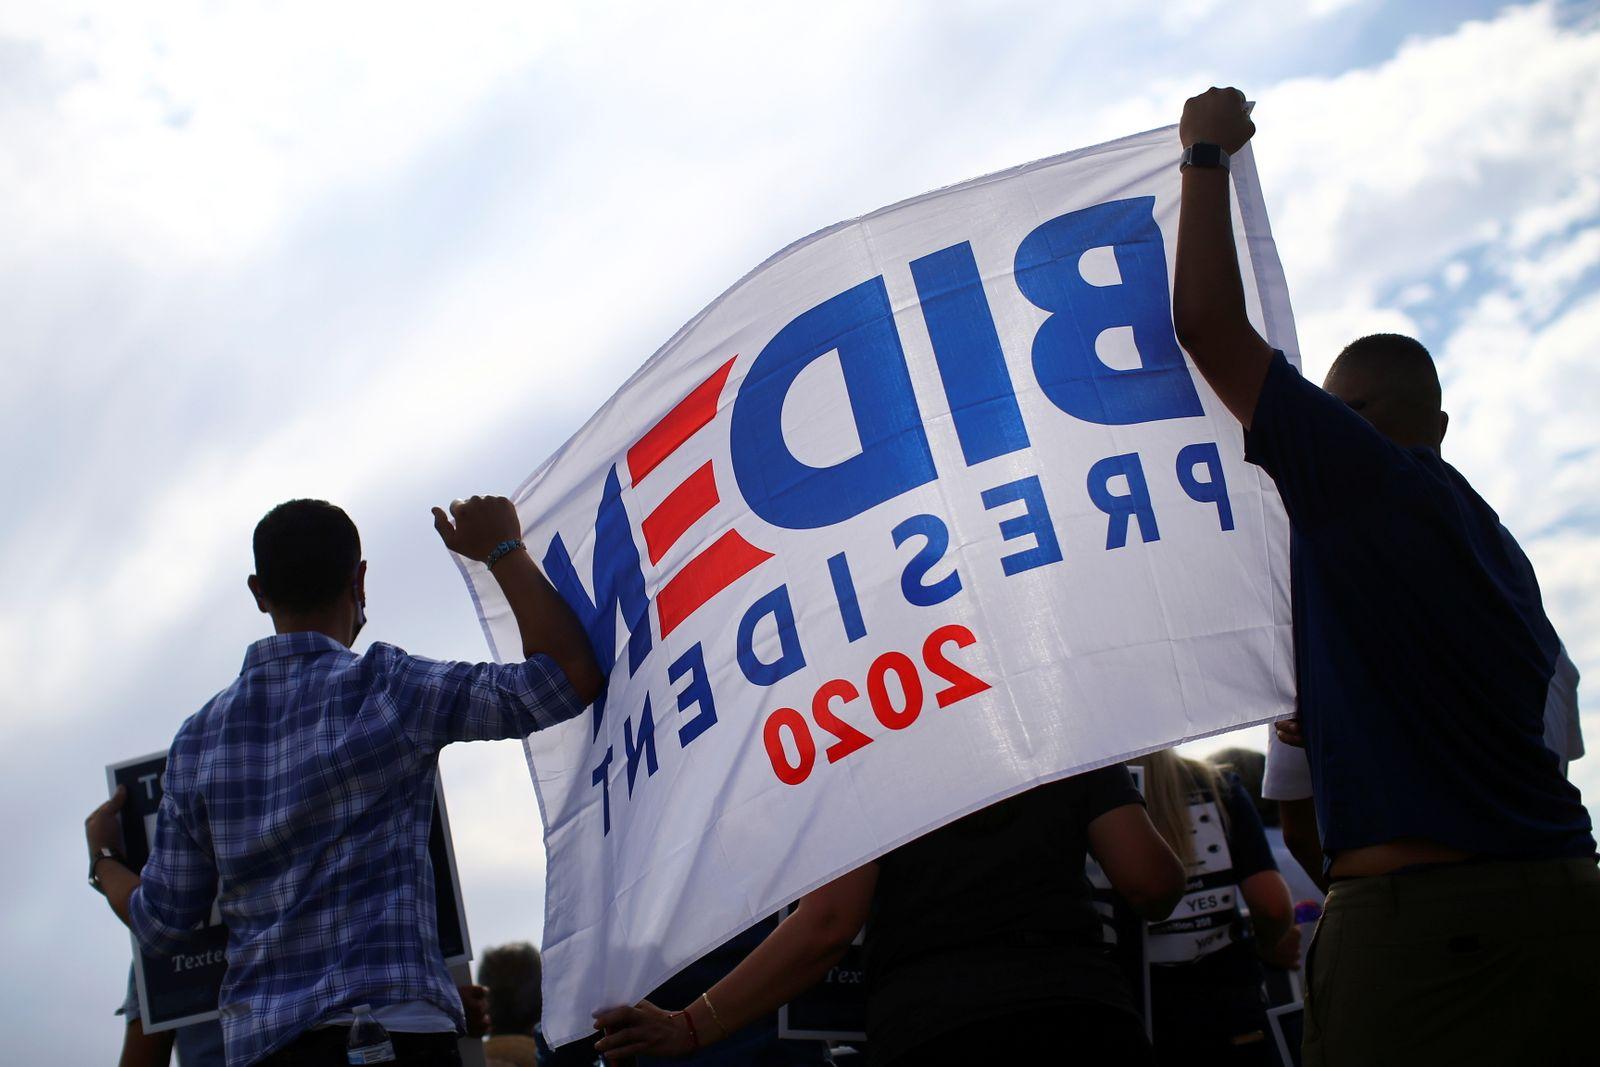 People attend an event in support of Democratic U.S. presidential nominee Joe Biden at a public park in Phoenix, Arizona